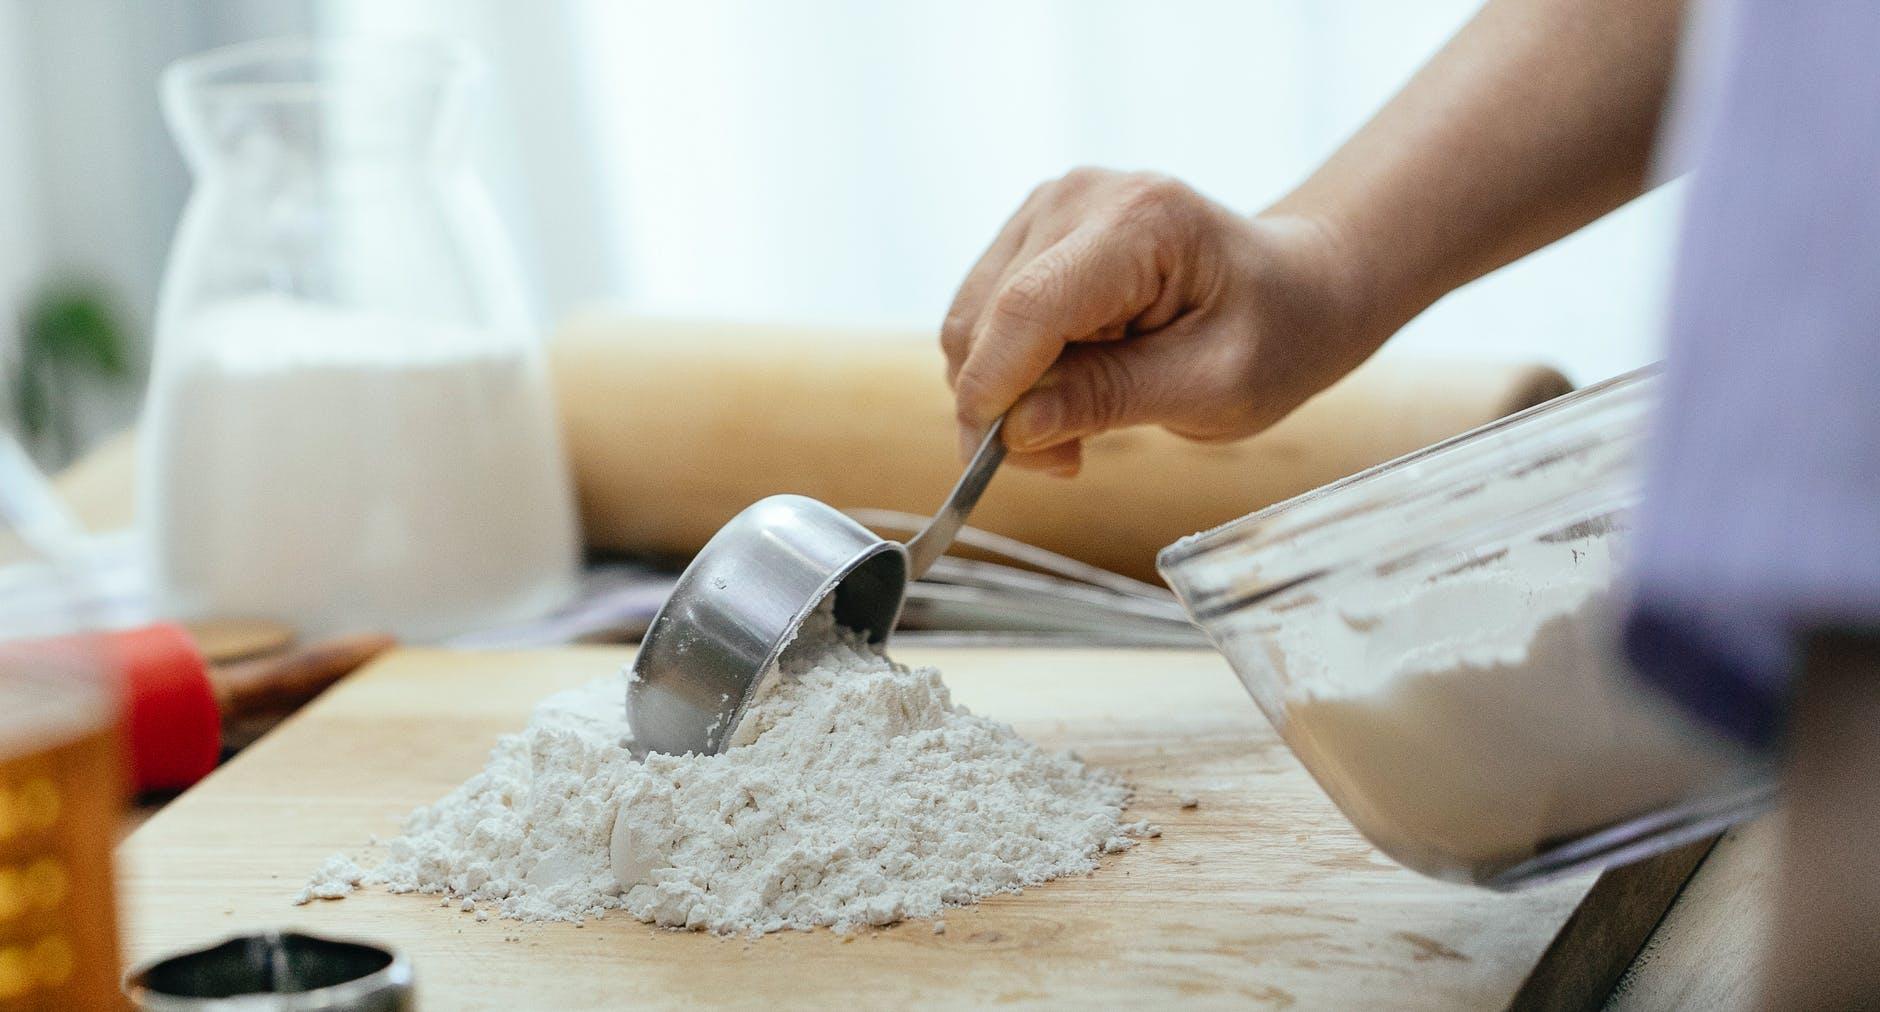 crop adult woman adding flour on wooden cutting board